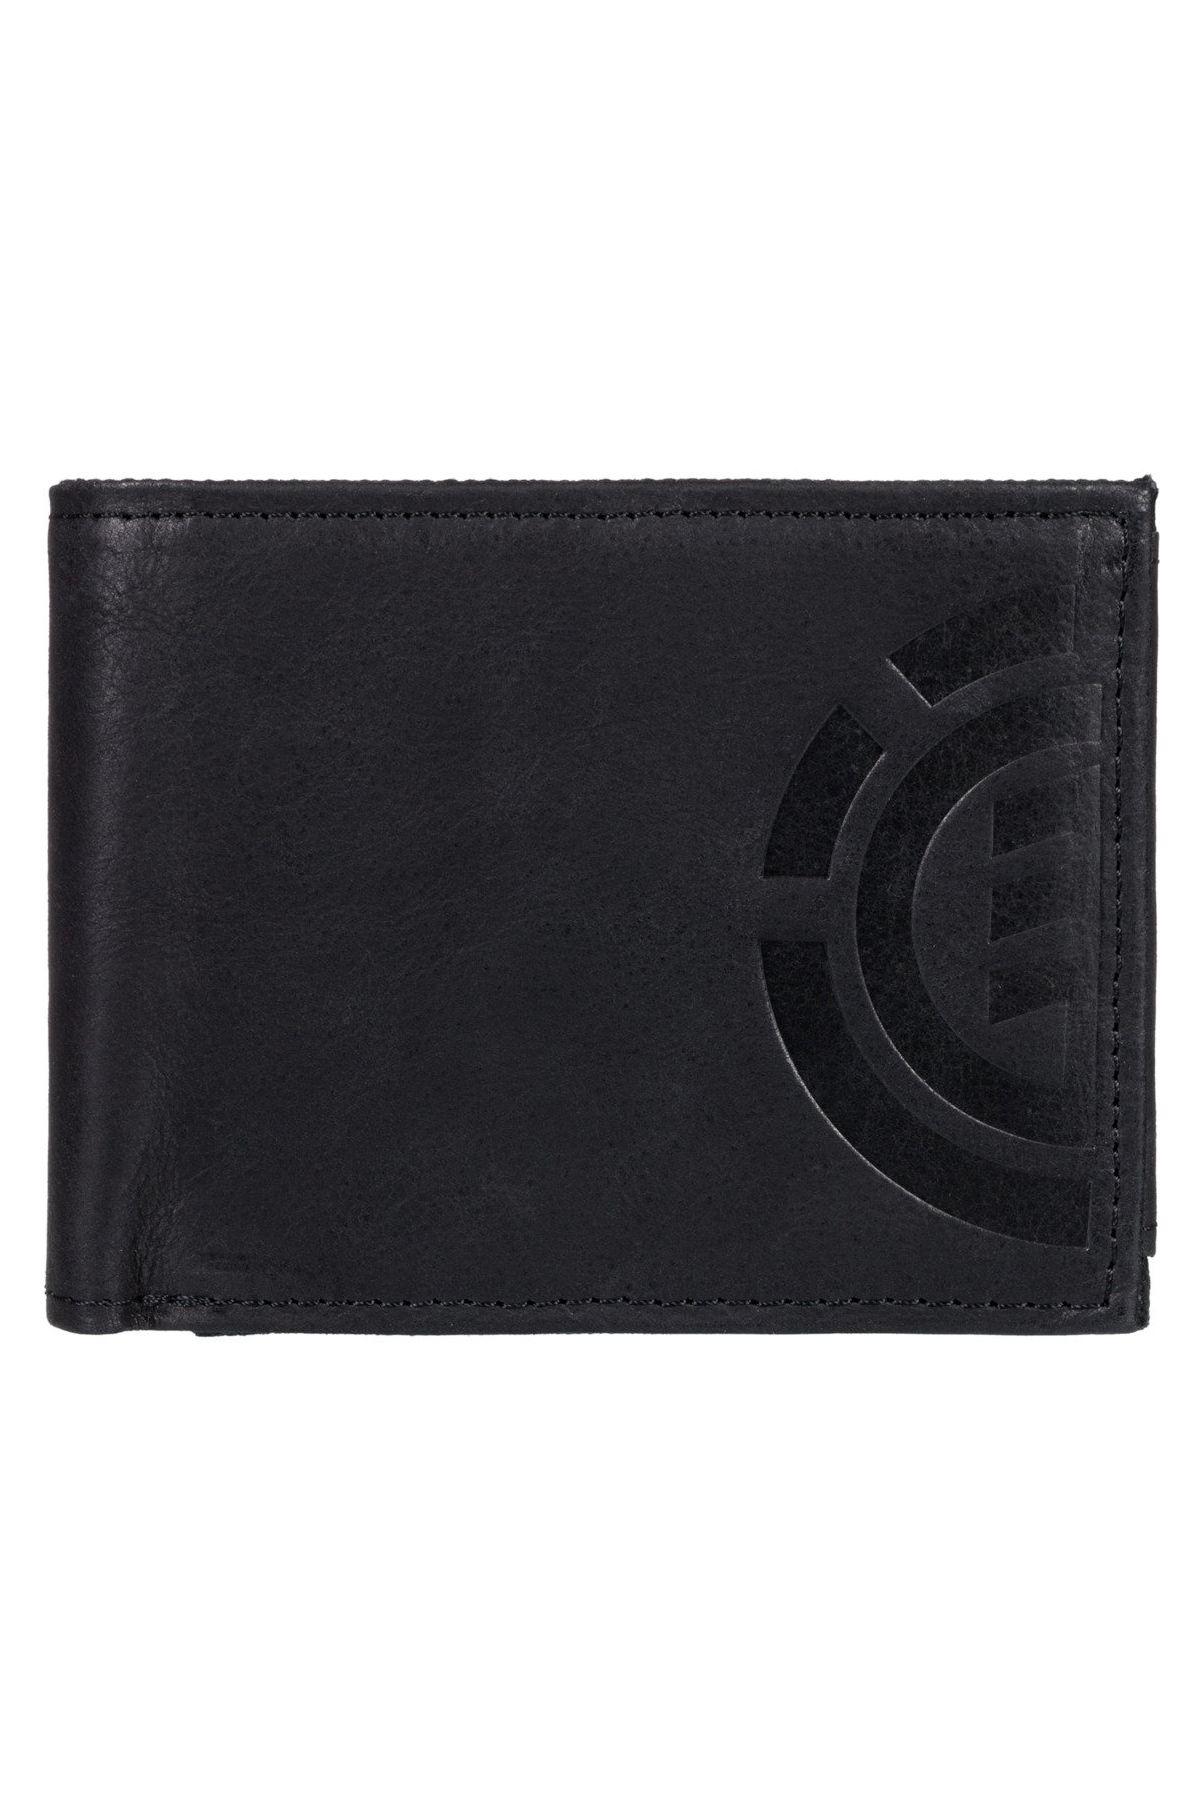 Element Leather Wallet DAILY ELITE WALLET Black